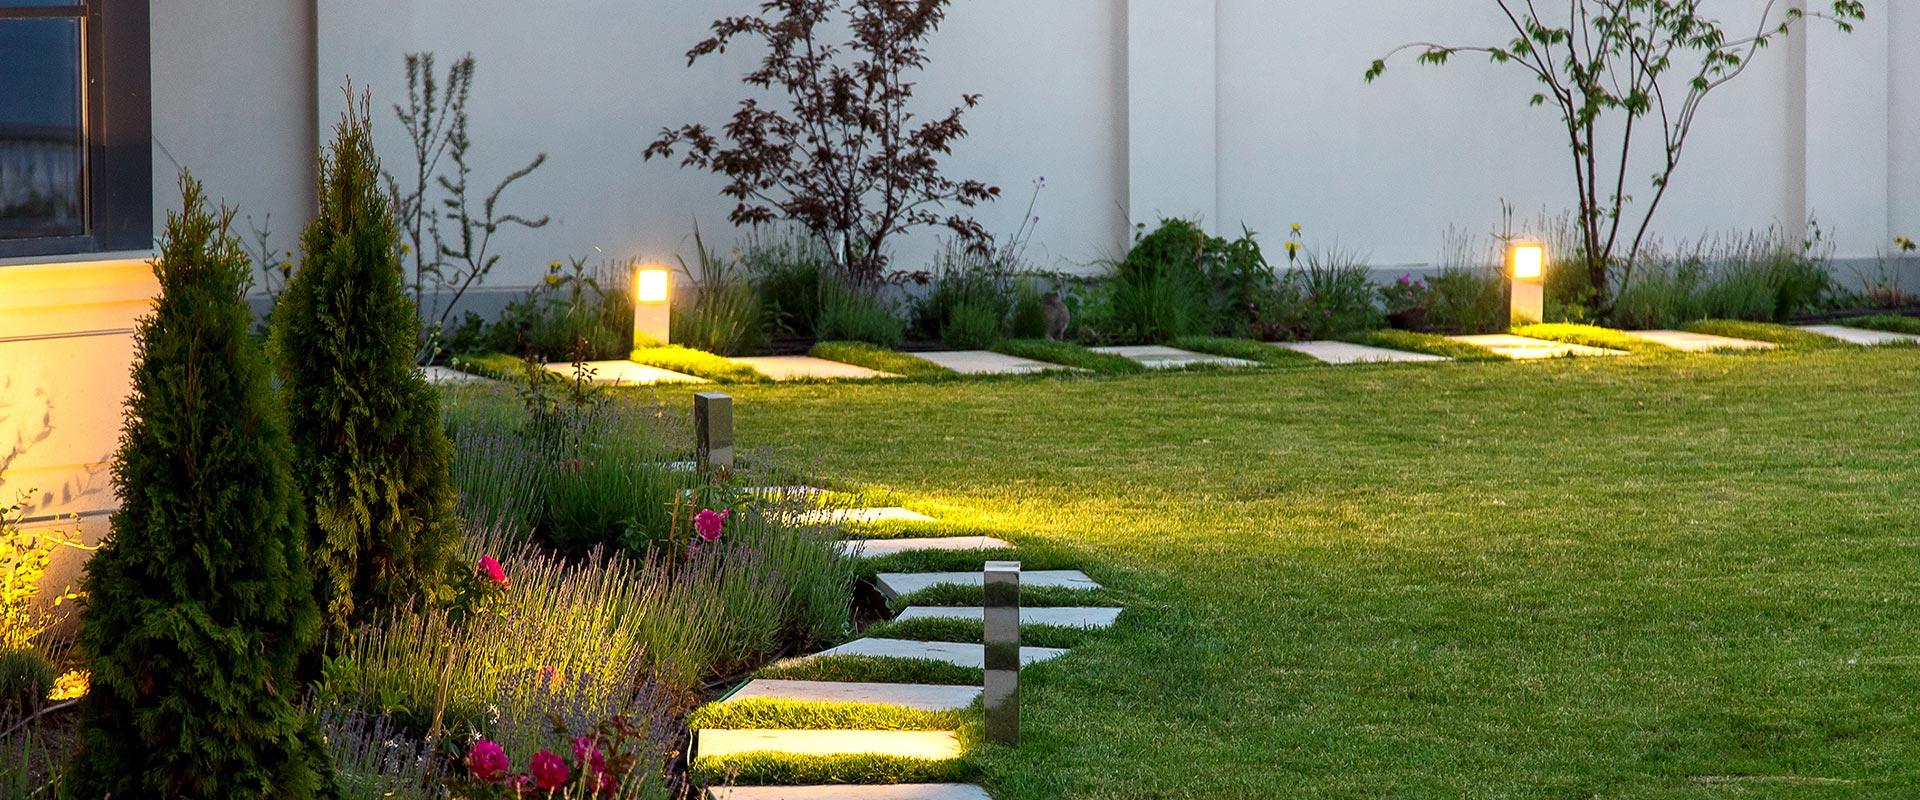 garden with landscape lighting